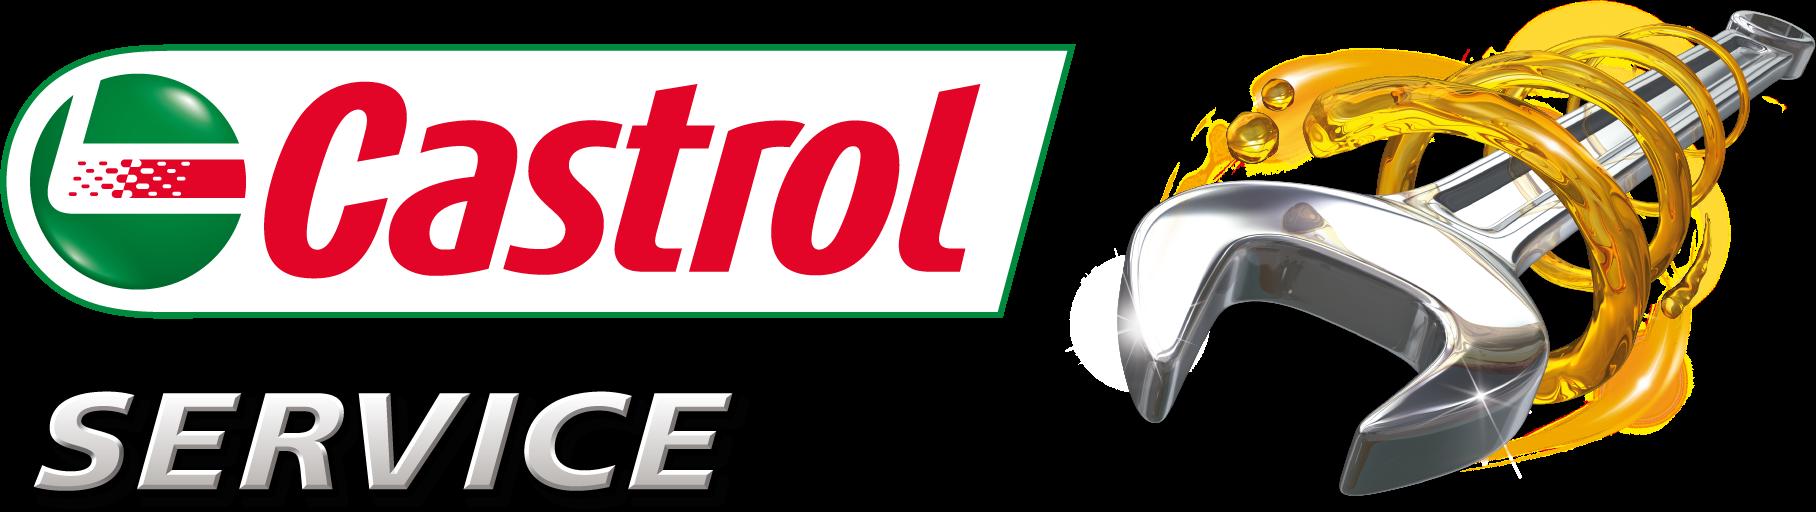 Castrol Service